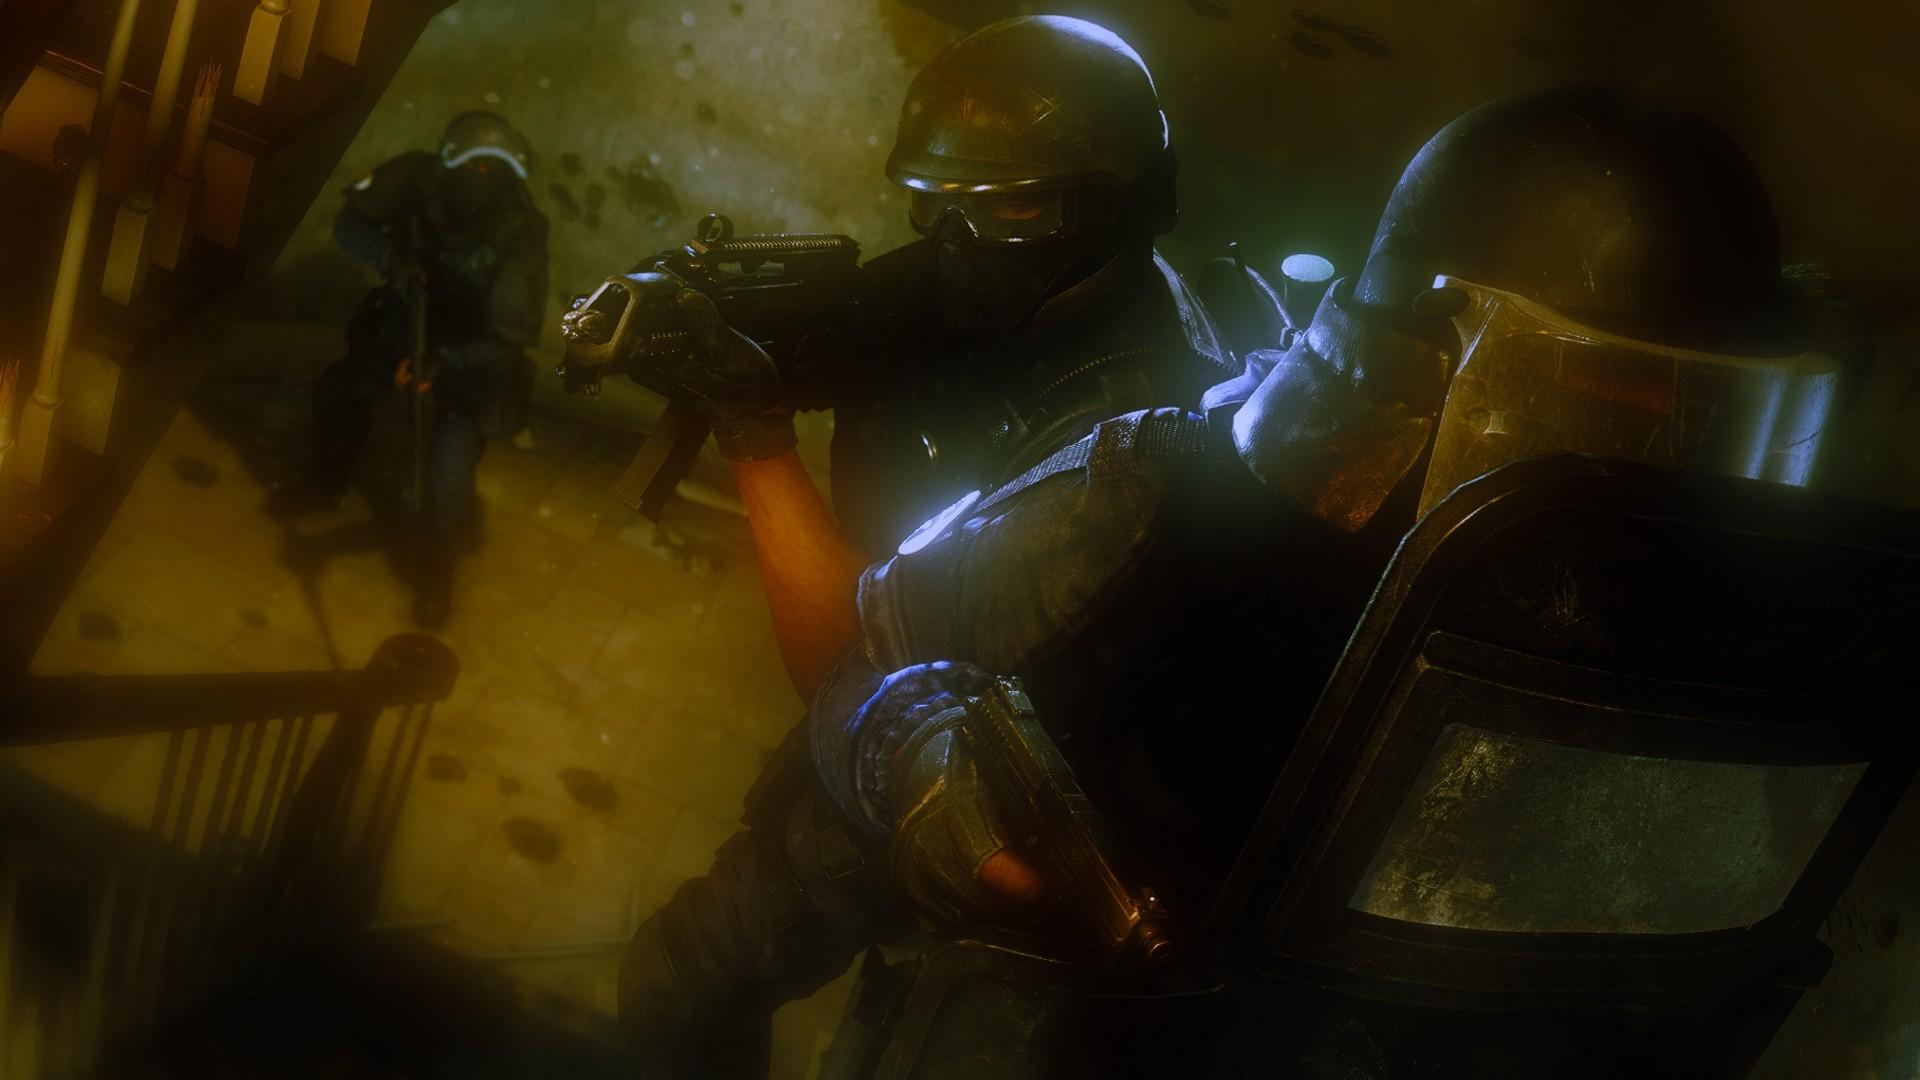 Wallpaper : water, Rainbow Six Siege, SWAT, darkness